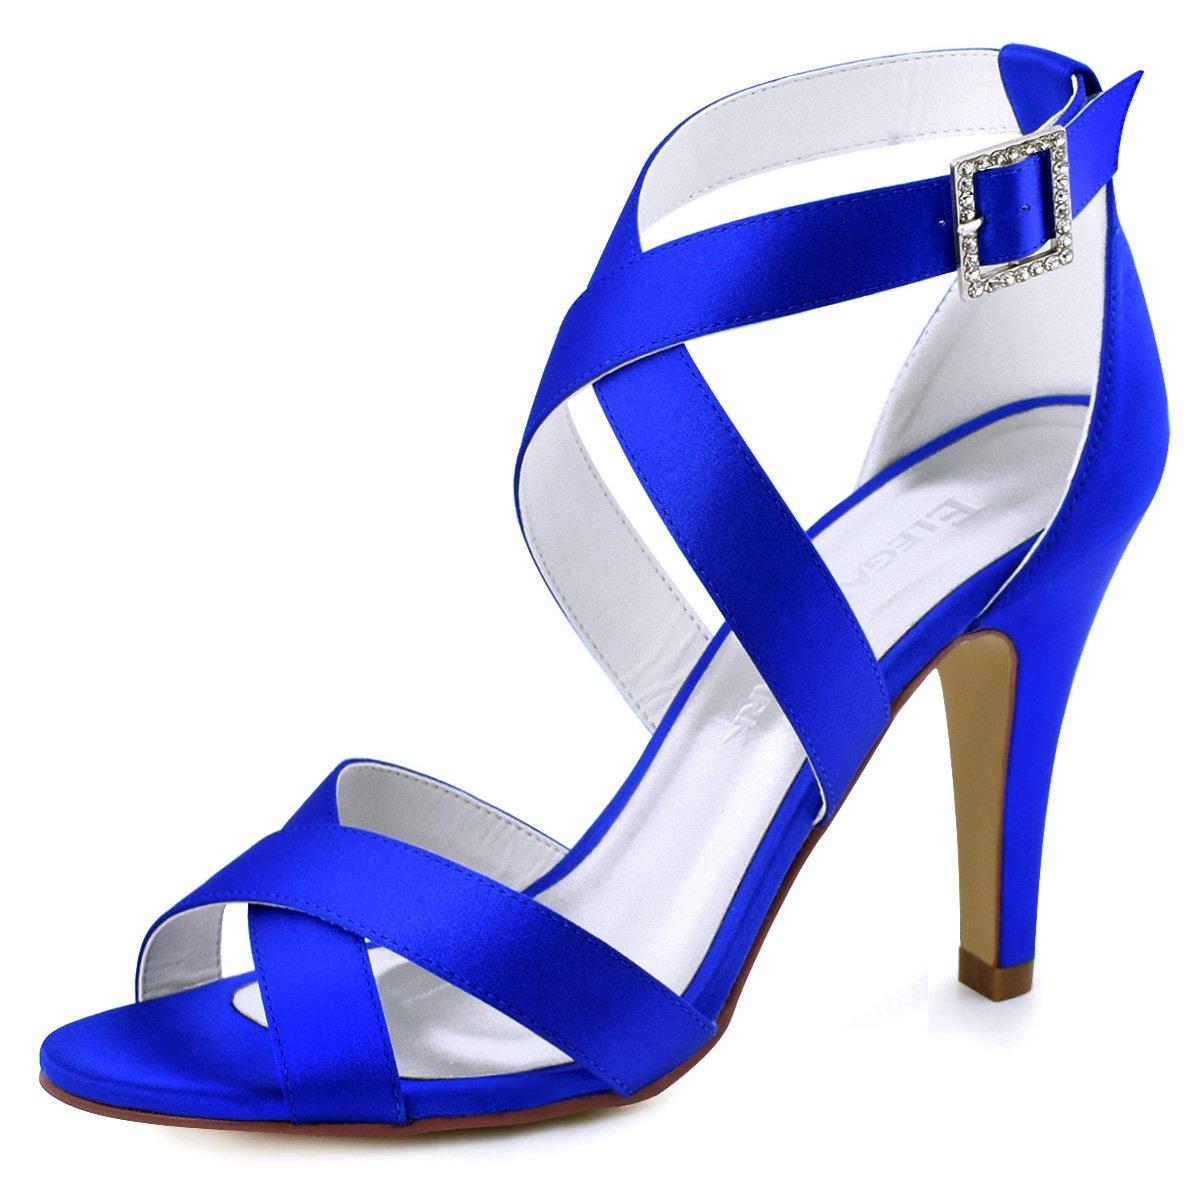 ElegantPark HP1705 Women High Heel Shoes Open Toe Cross Strap Satin Wedding Dress Sandals Blue US 9